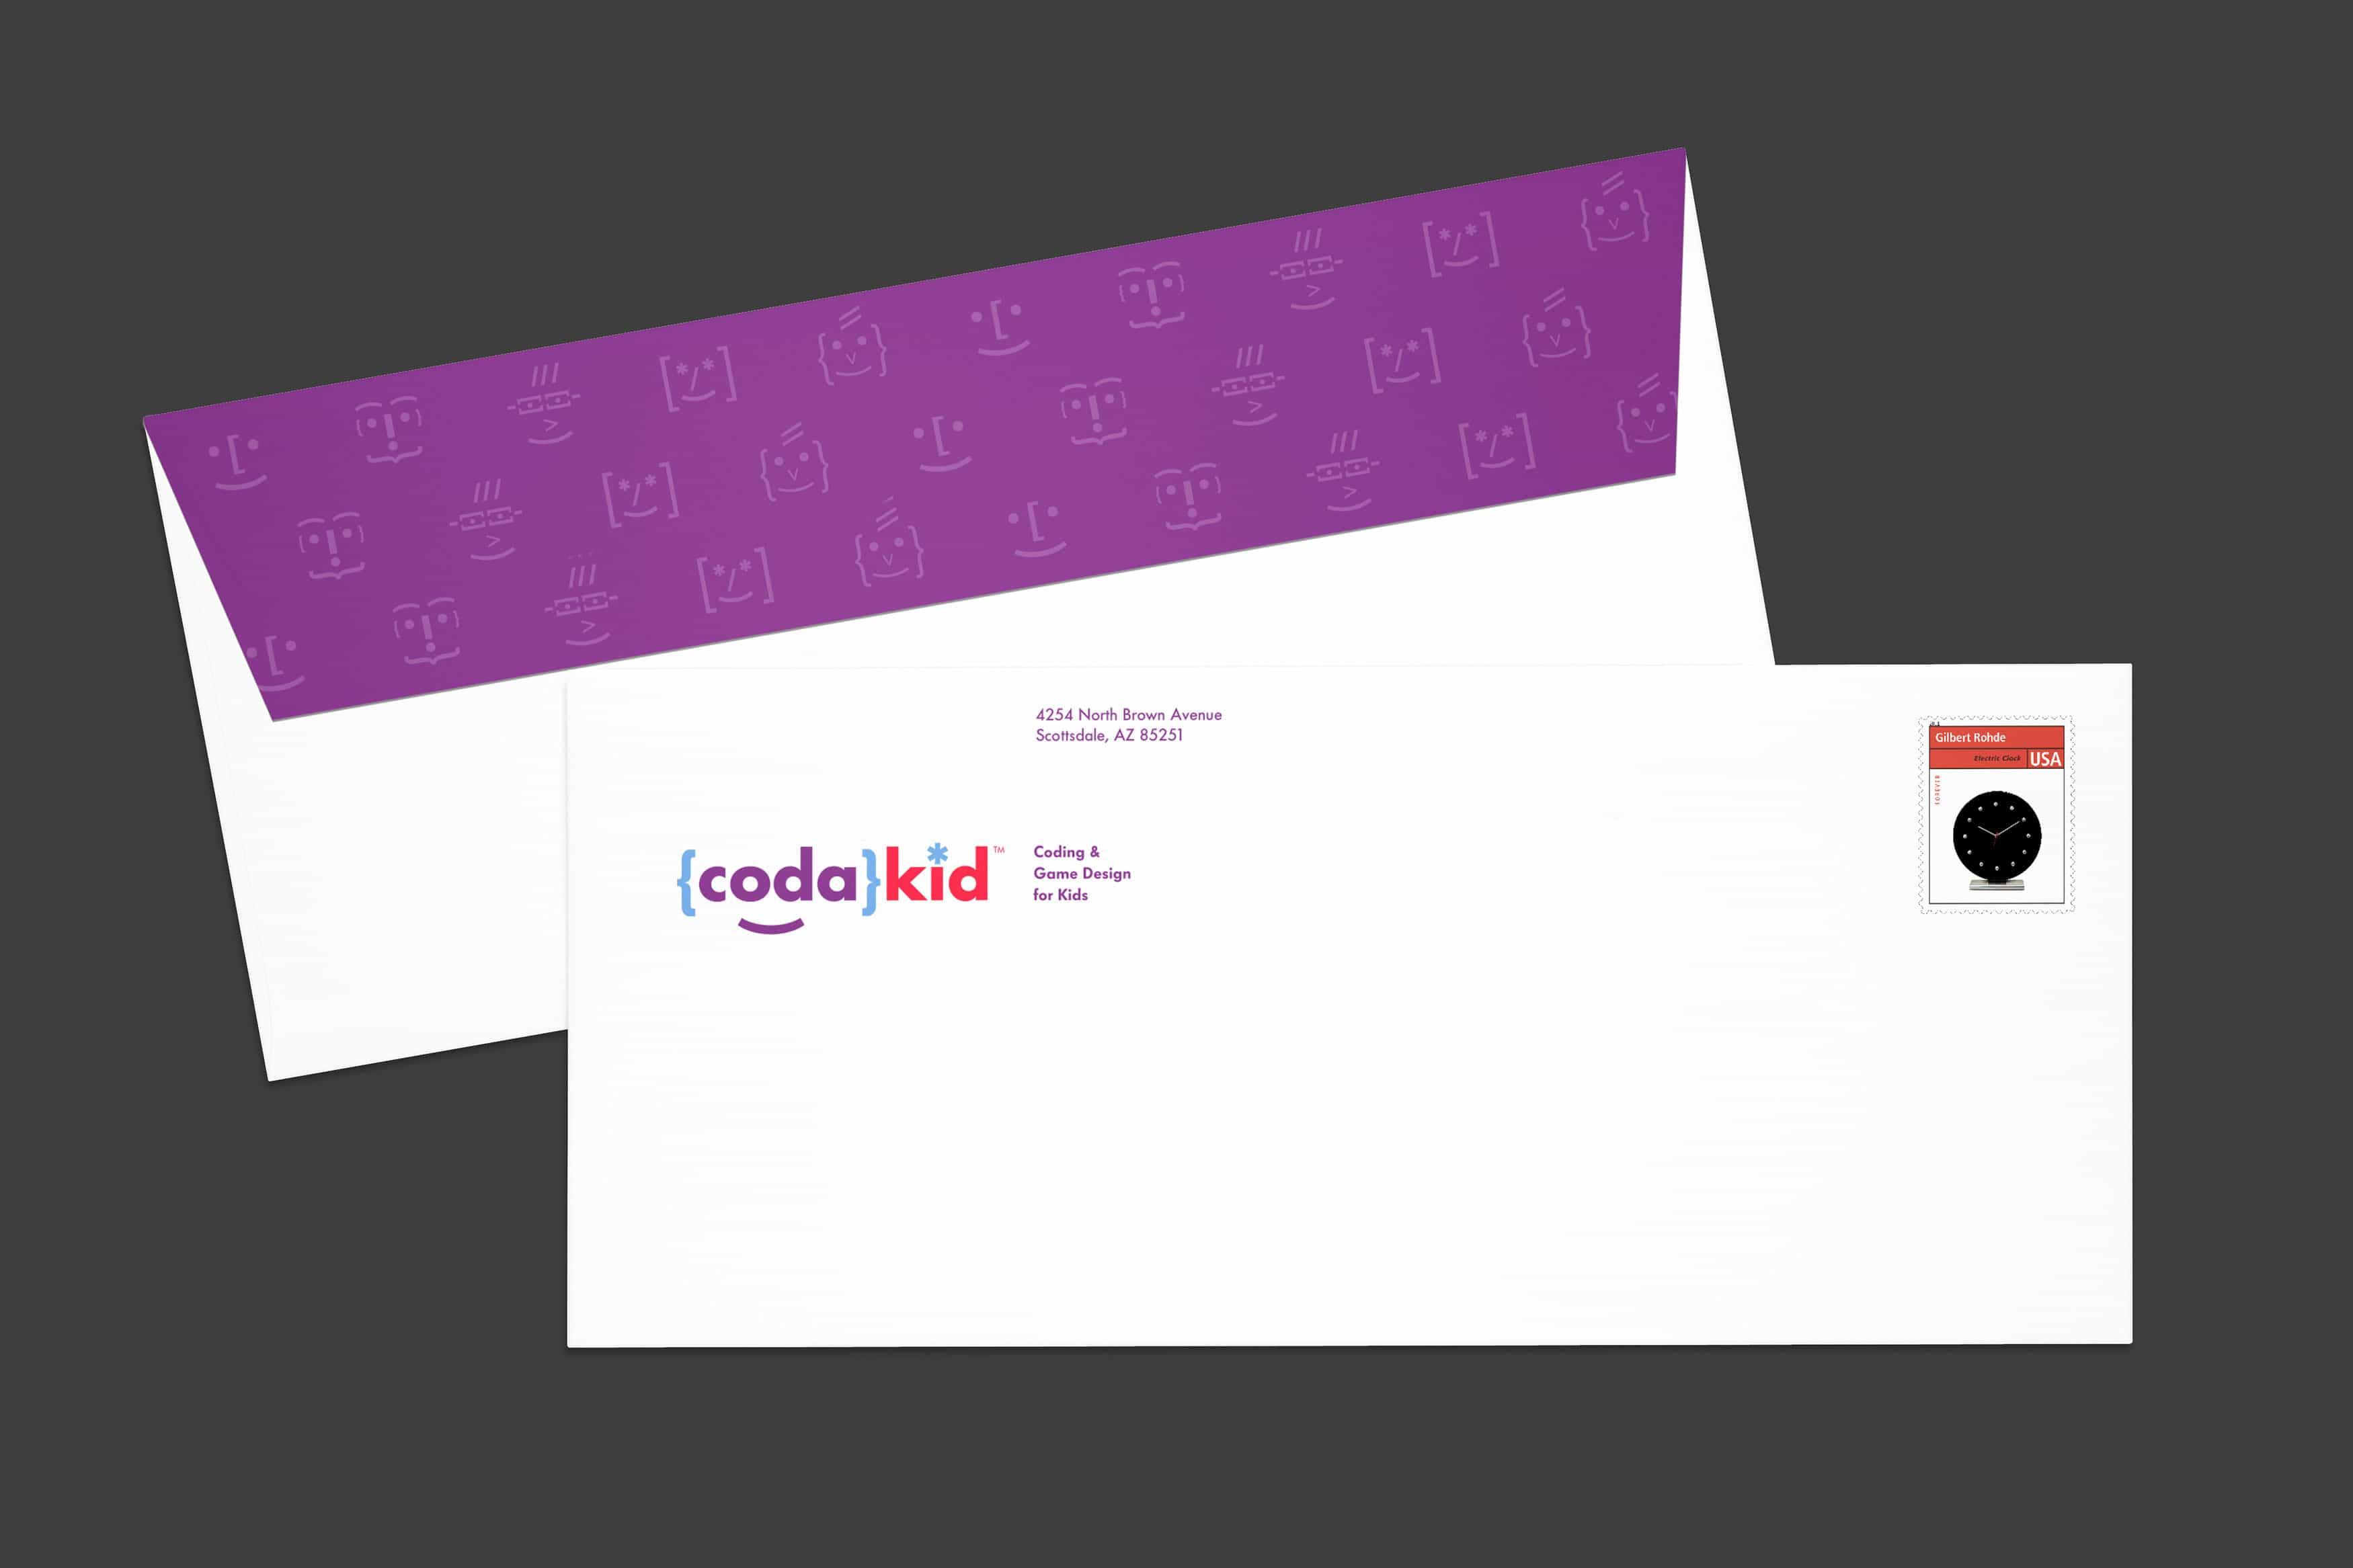 CodaKid Rebrand Application Envelope